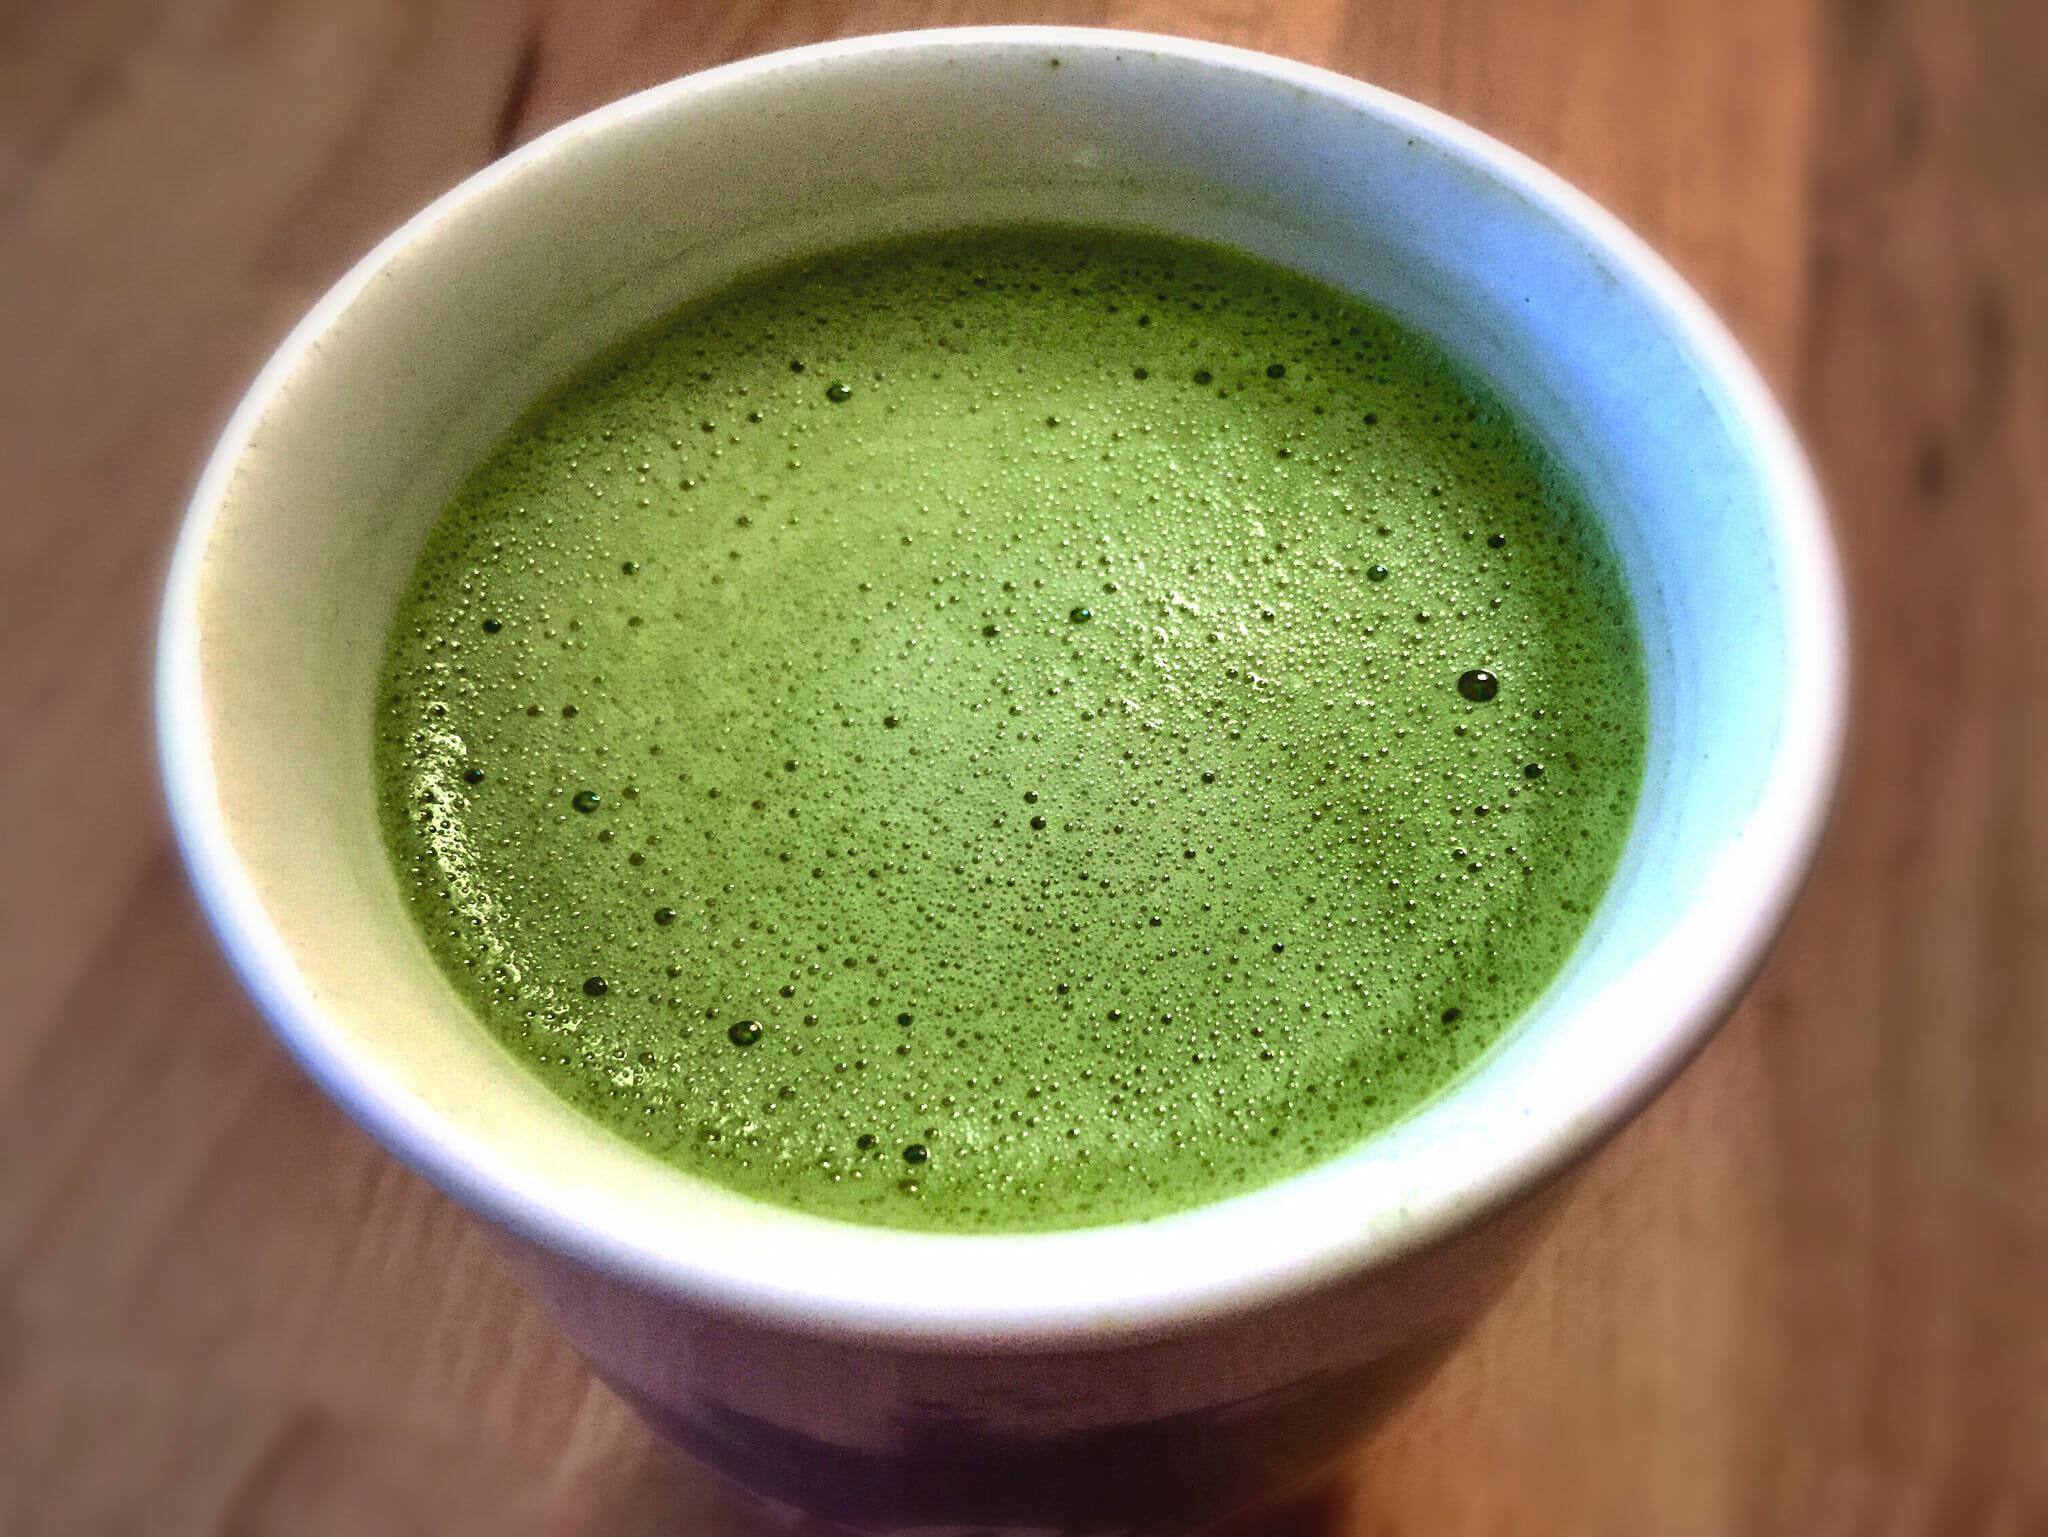 Green Tea Matcha Latte: Places to Get Caffeine Before Your DTLA Tour